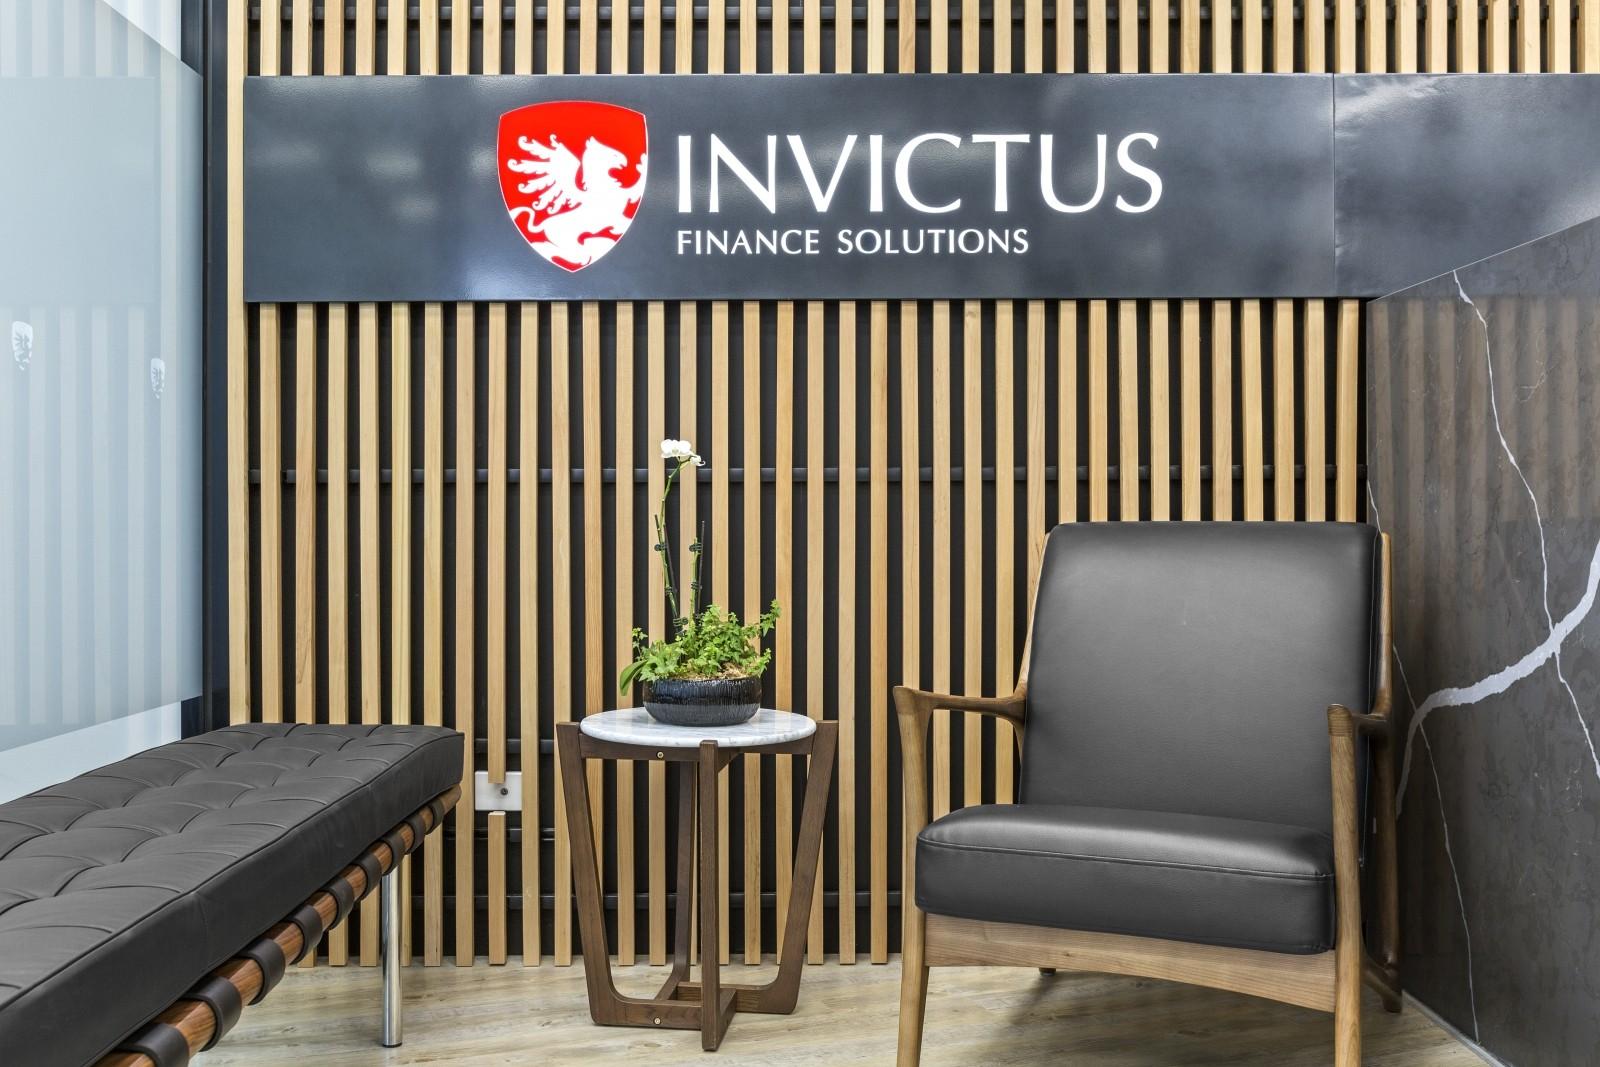 Invictus Finance Solutions   LinkedIn